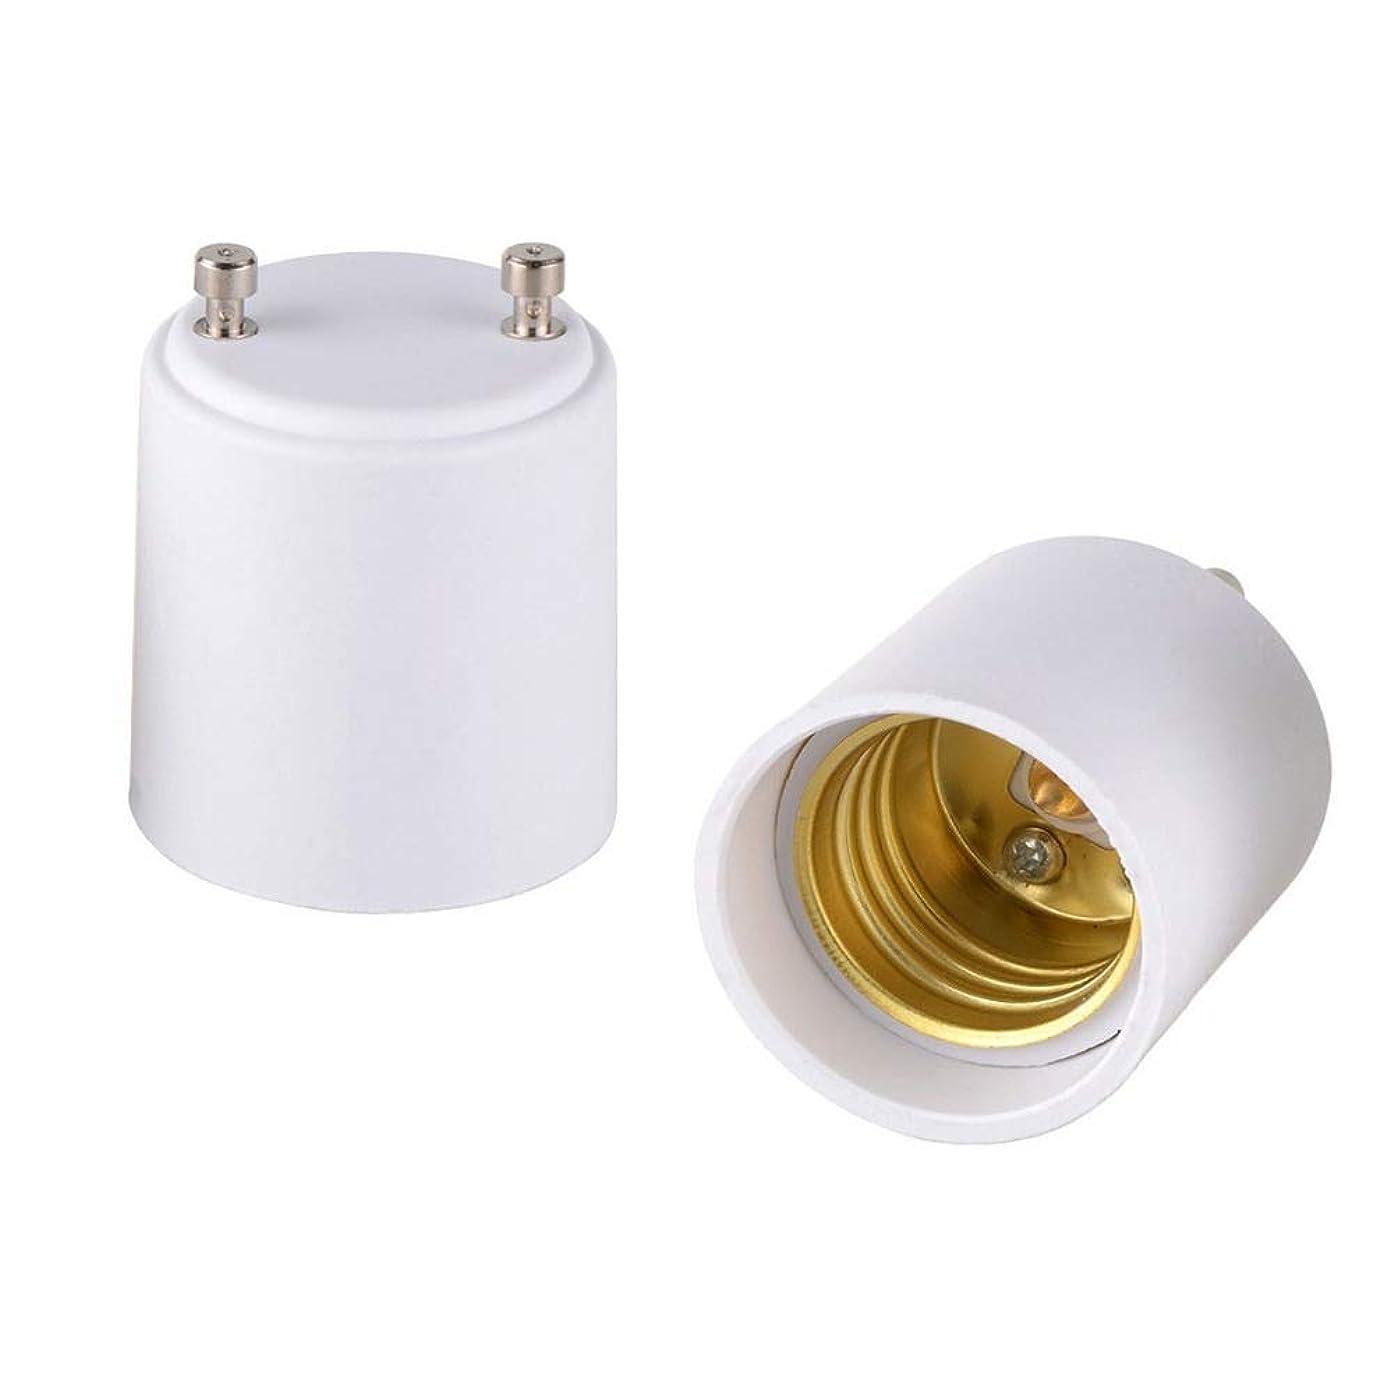 Zelta GU24 to E26 Bulb Adapter, Converts GU24 Pin Base Fixture to E26/E27 Standard Screw-in Socket, Packs of 3